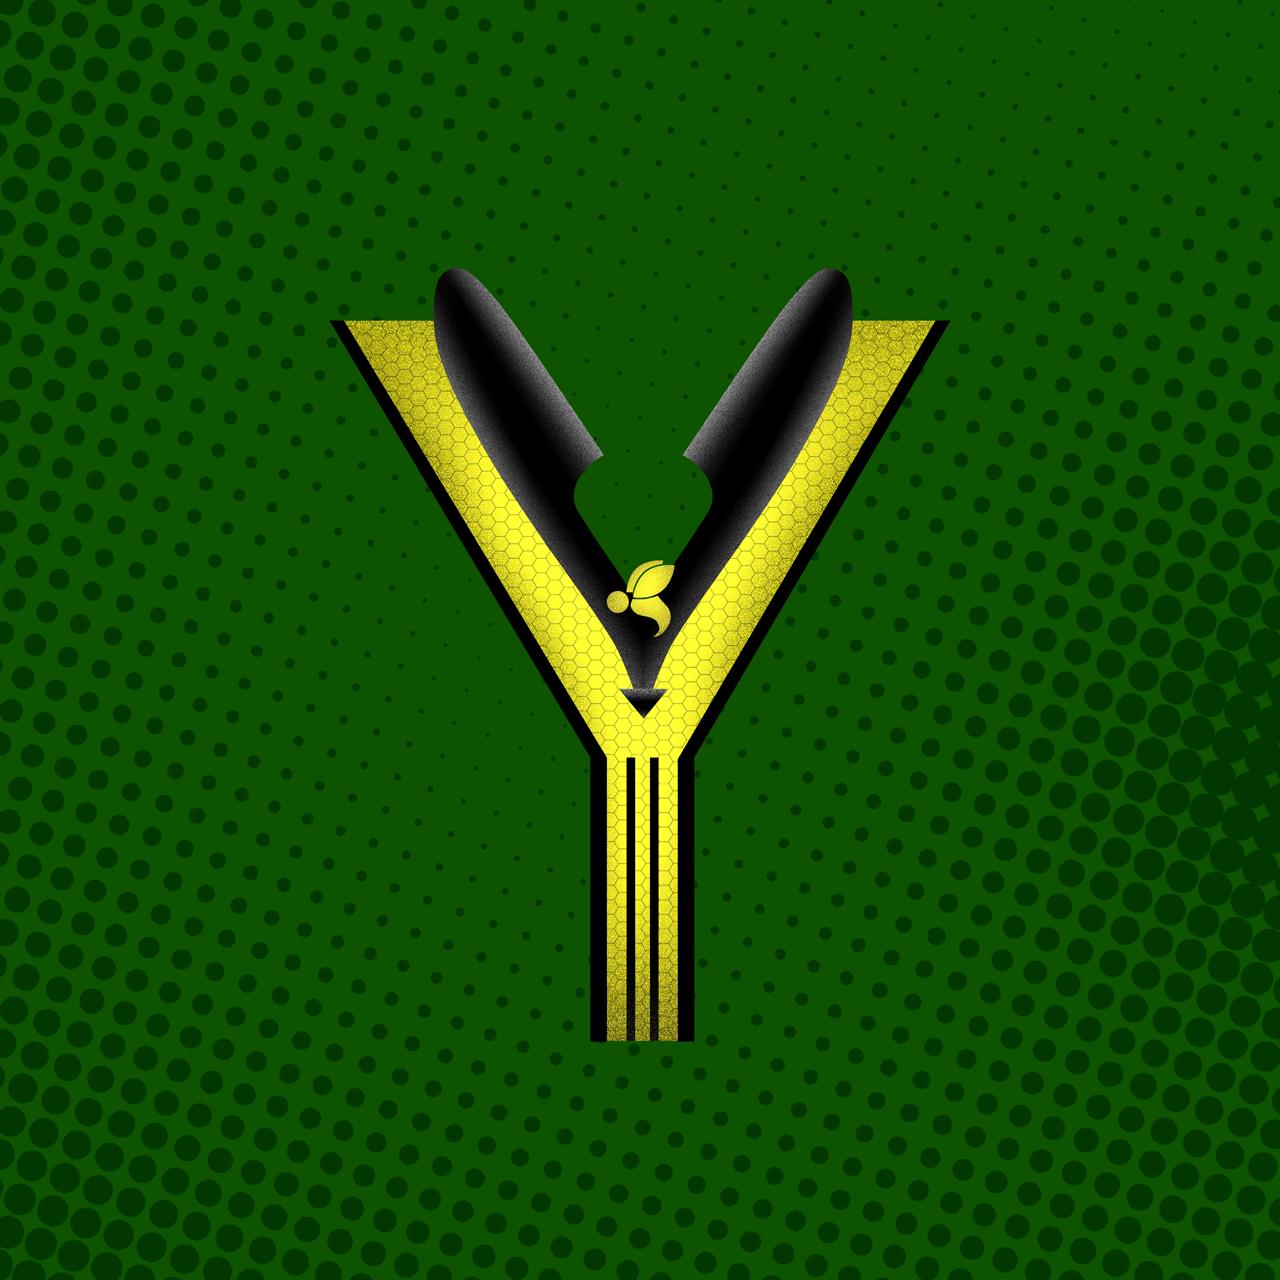 Y-yellowjacket.png